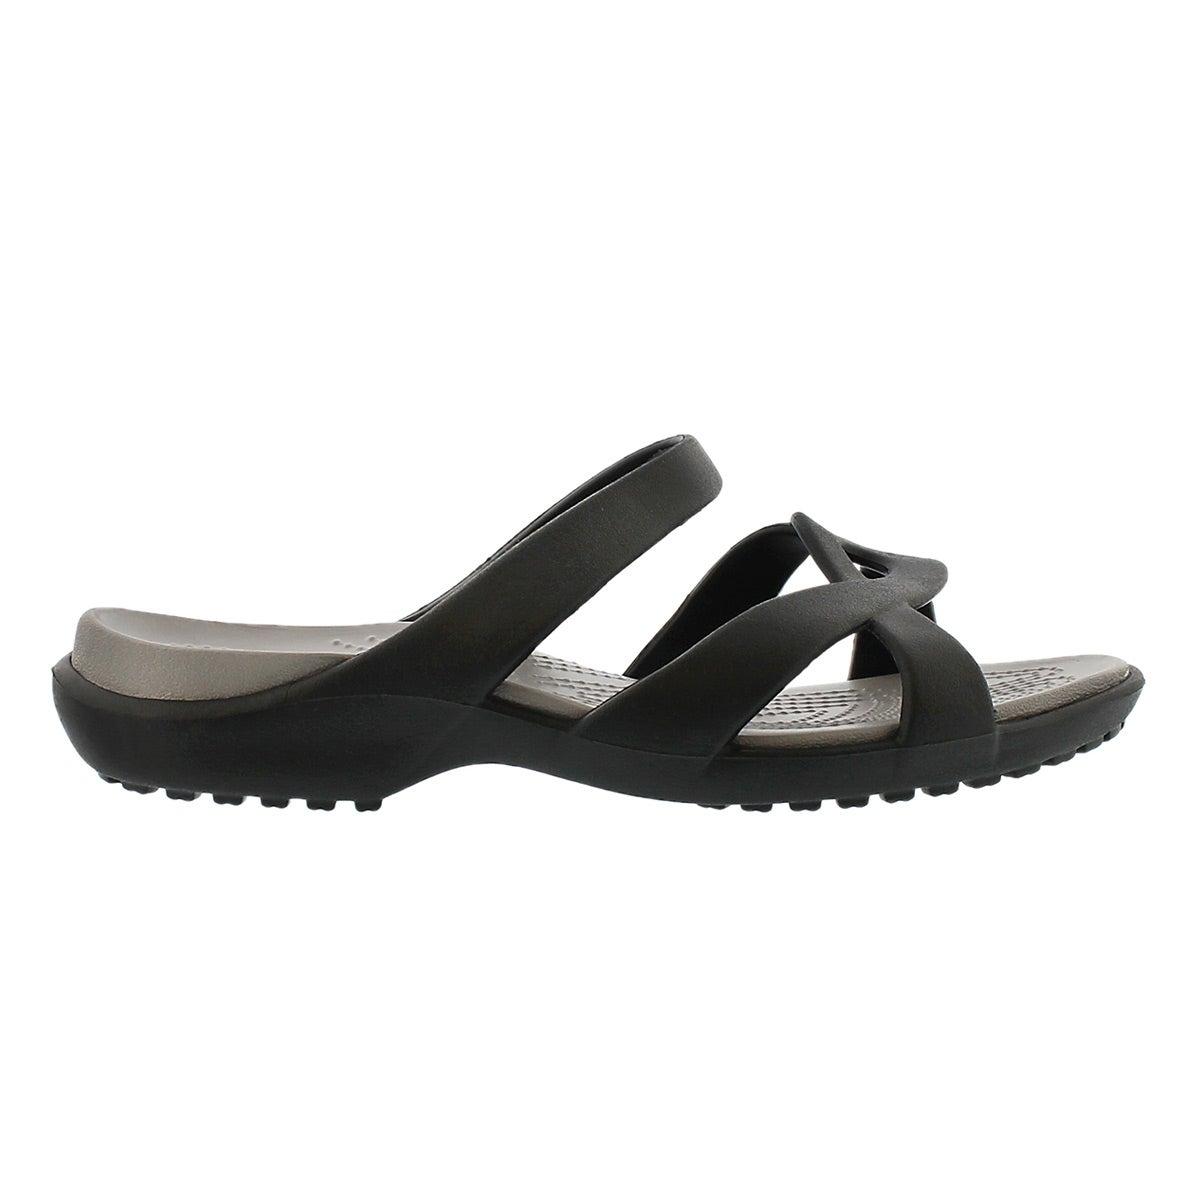 Lds Meleen Twist black casual sandal